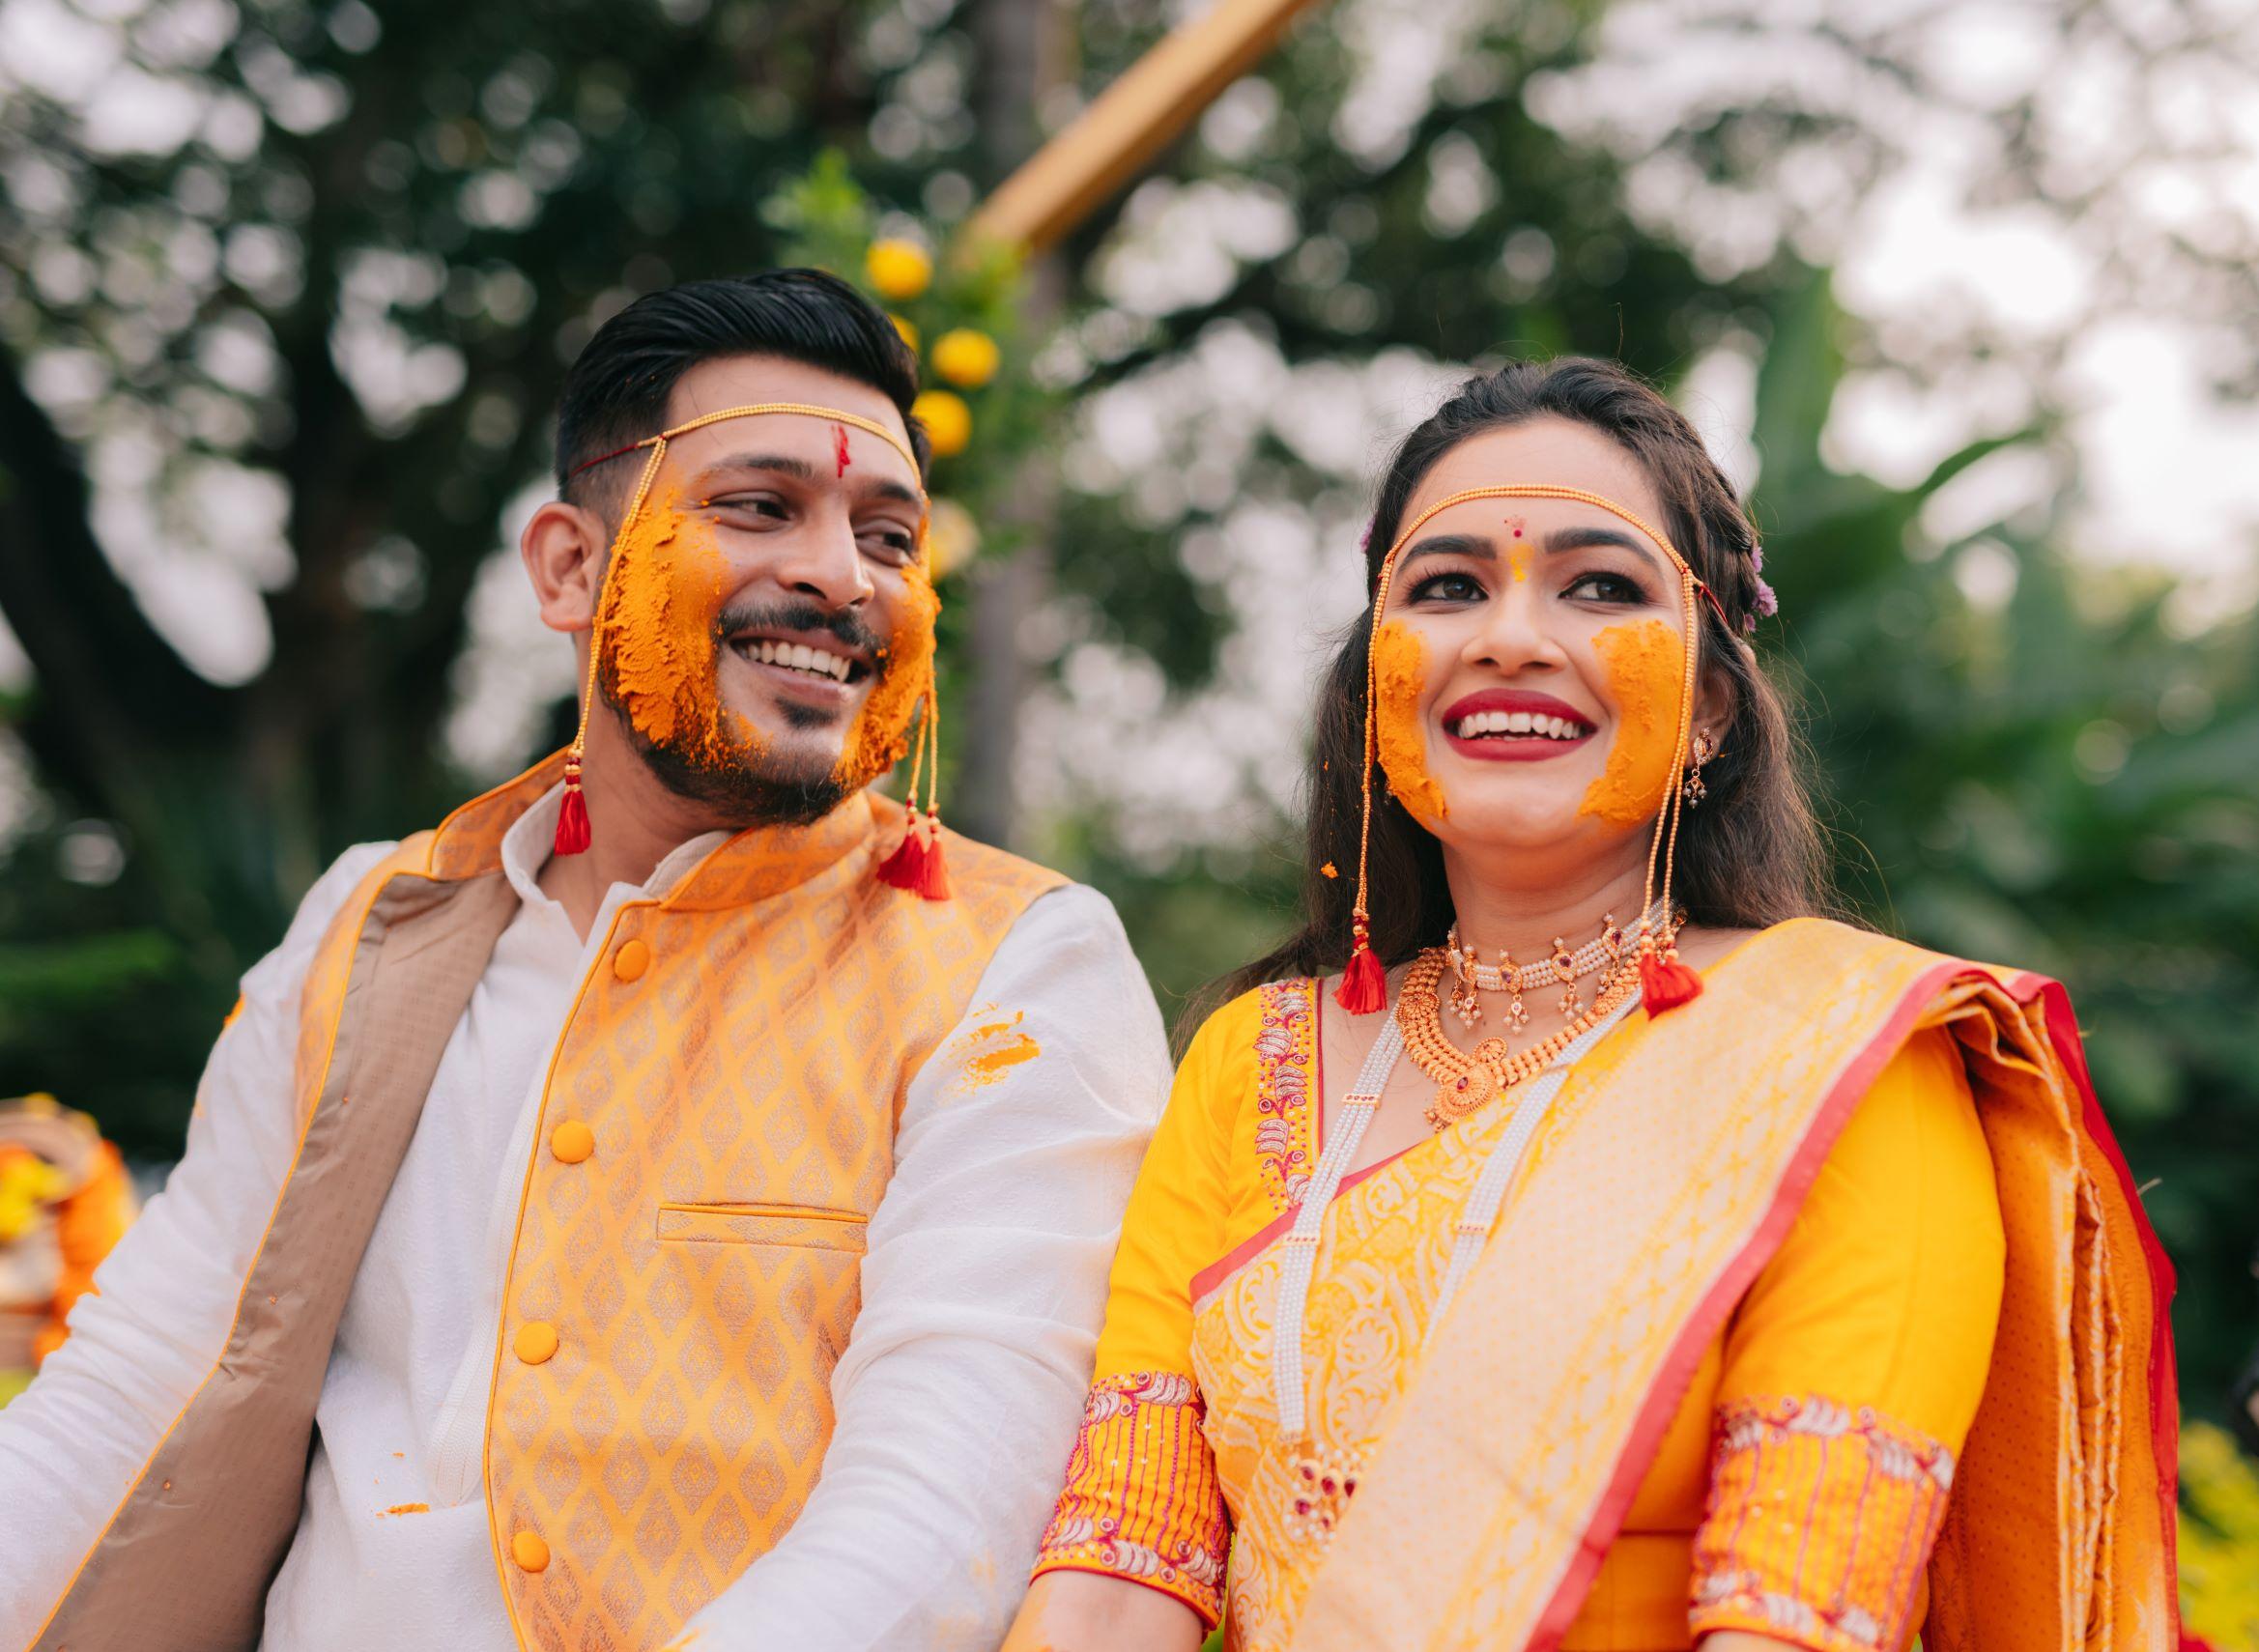 maharashtrian couple at their haldi